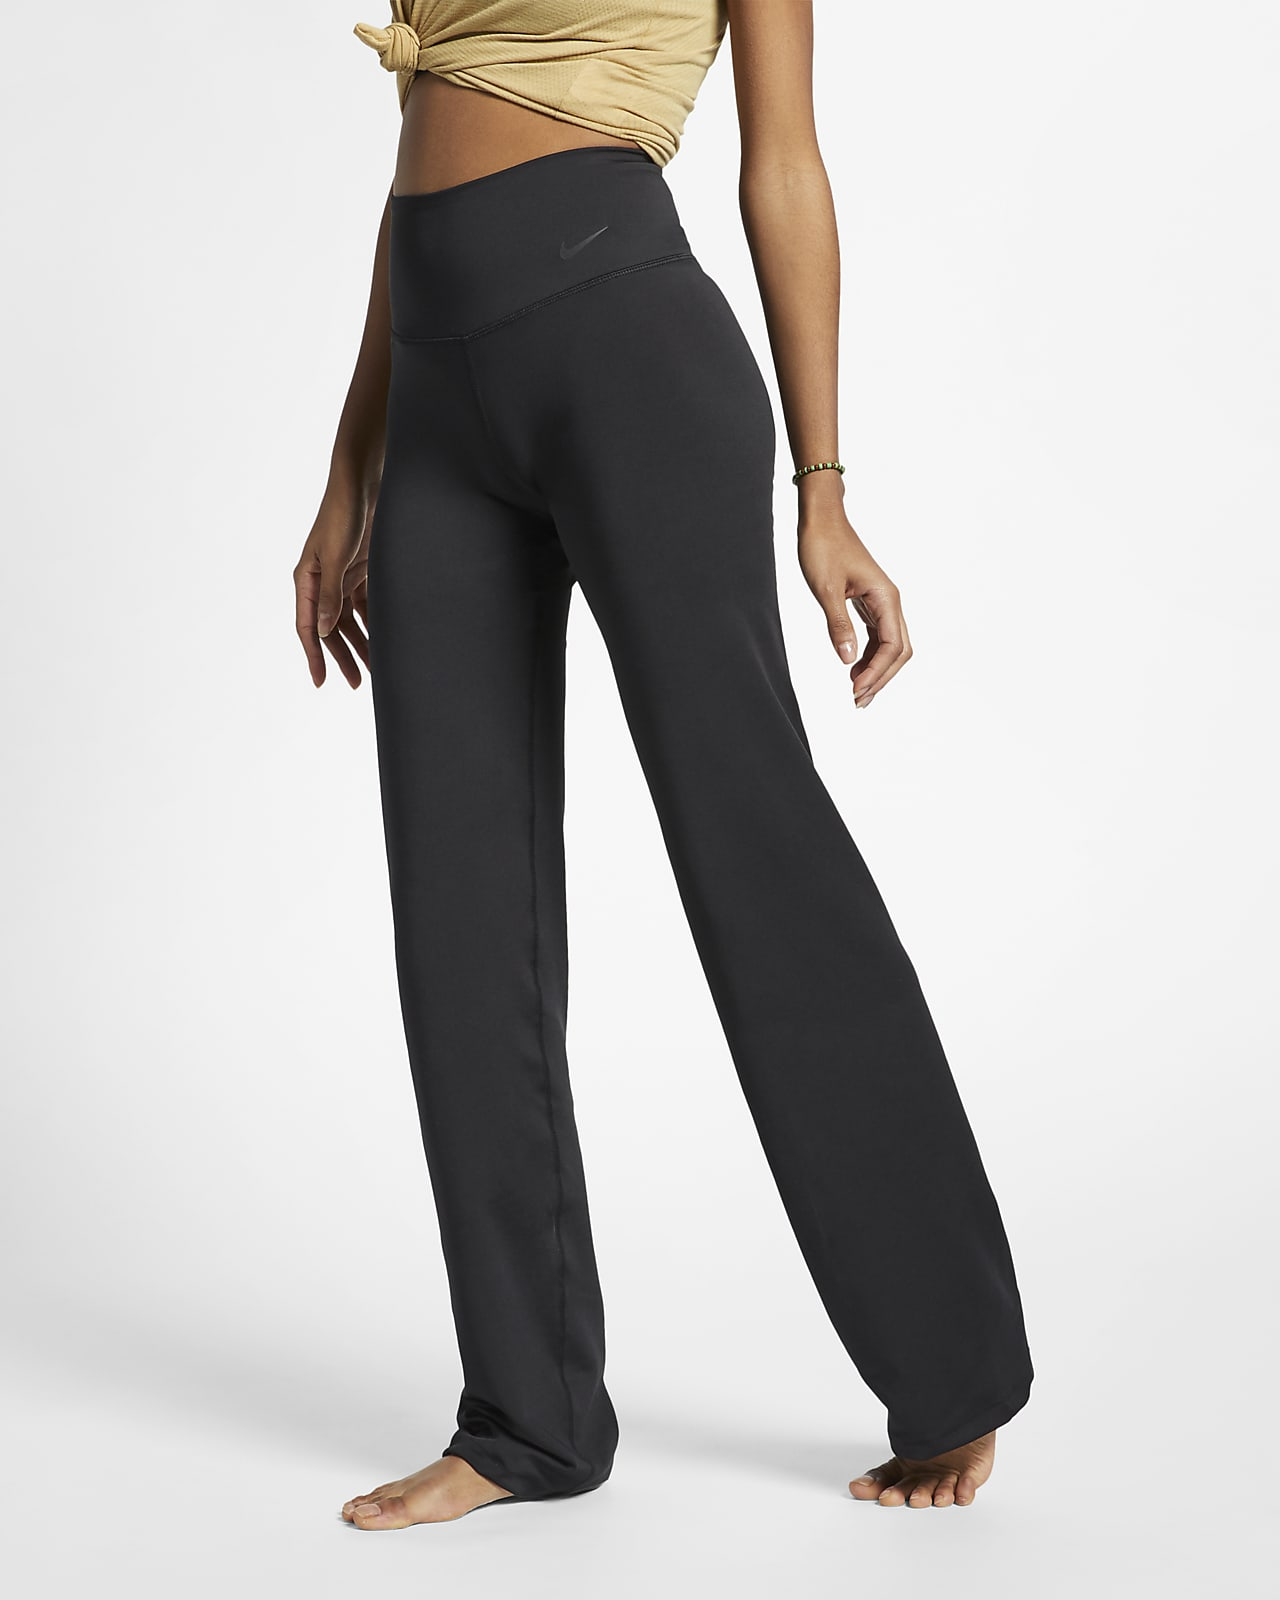 pastor Asistencia ensillar  Nike Power Women's Yoga Training Pants. Nike.com